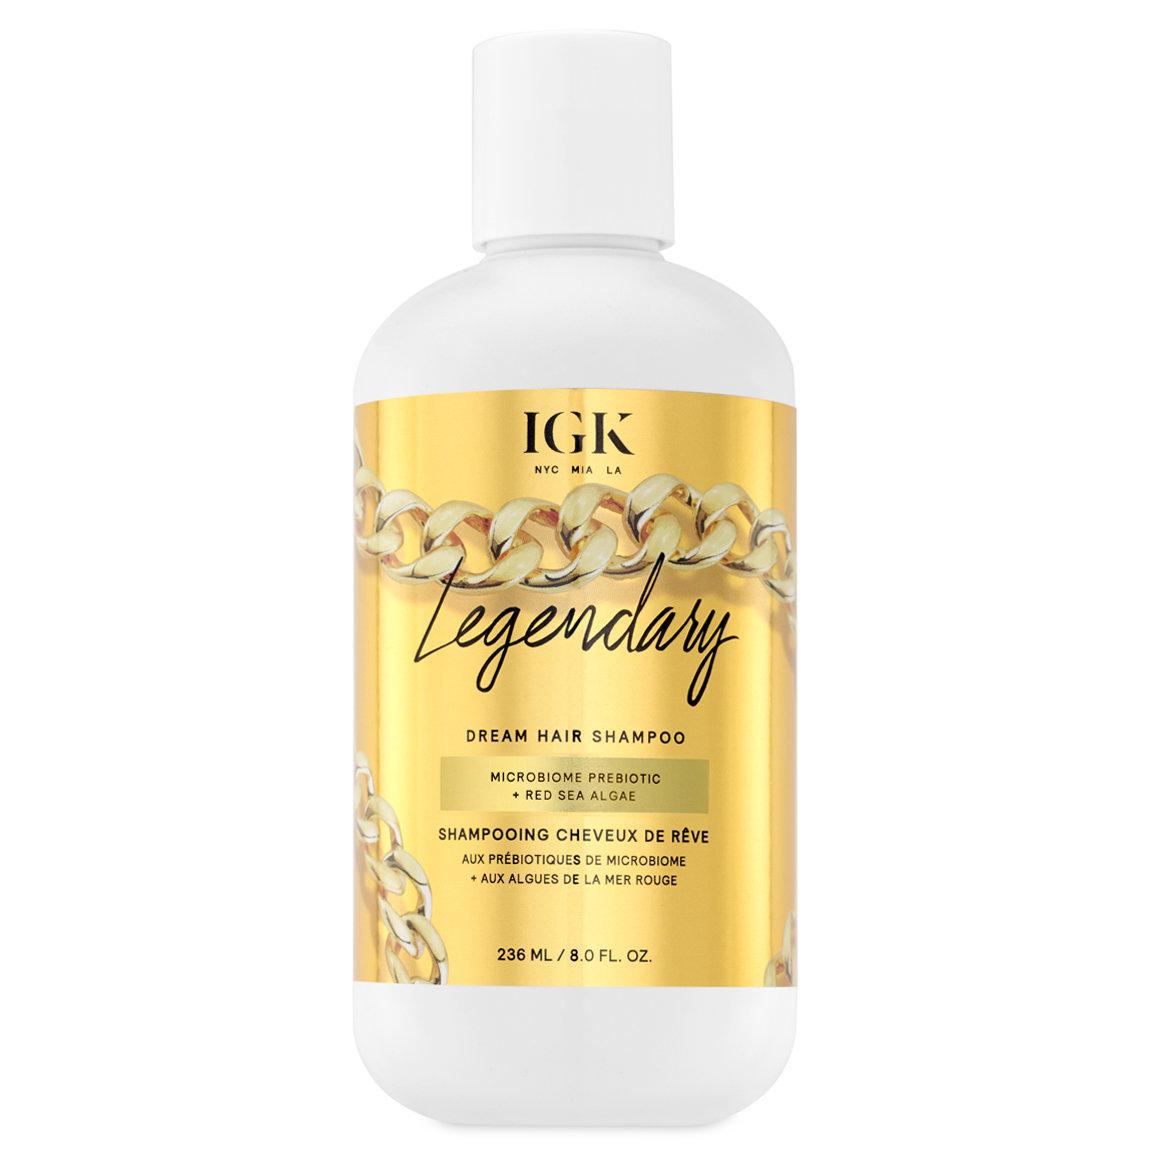 IGK Legendary Dream Hair Shampoo alternative view 1 - product swatch.